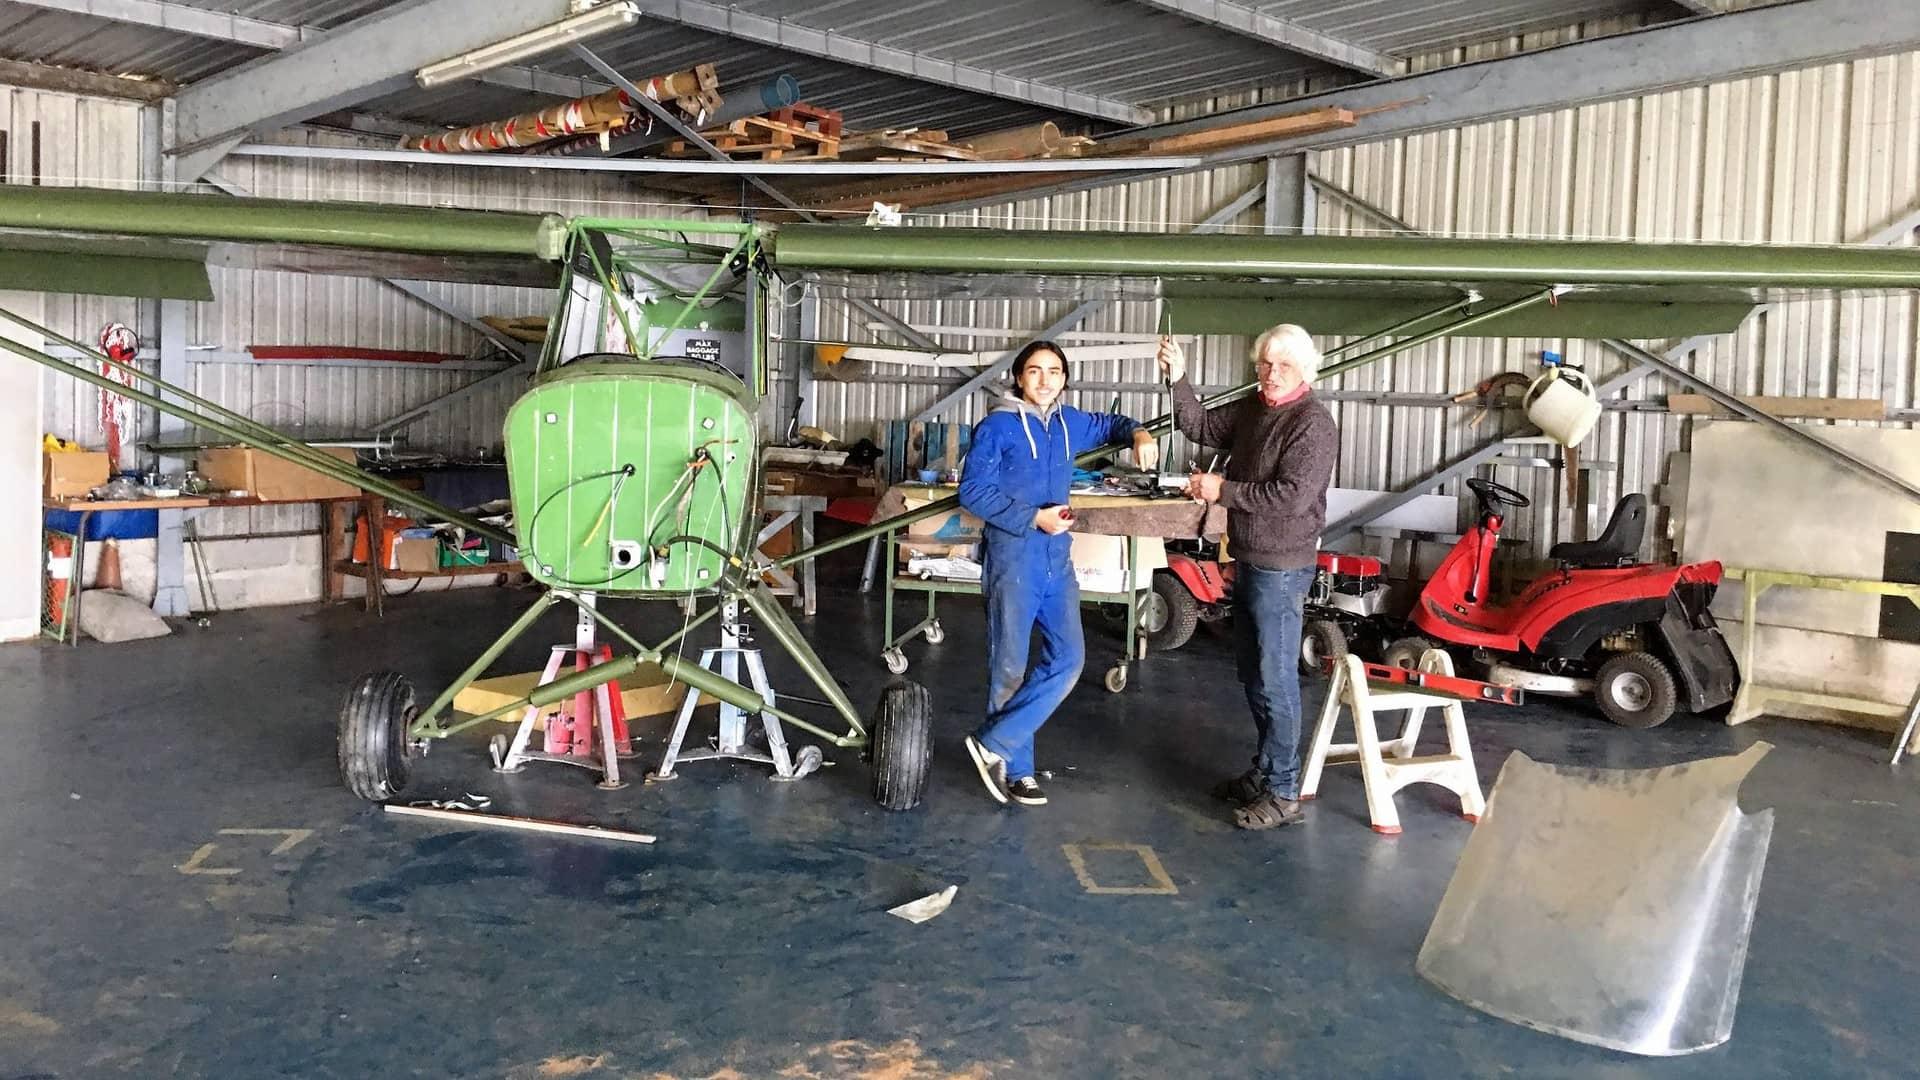 atelier-maintenance-aeronautique-assemblage